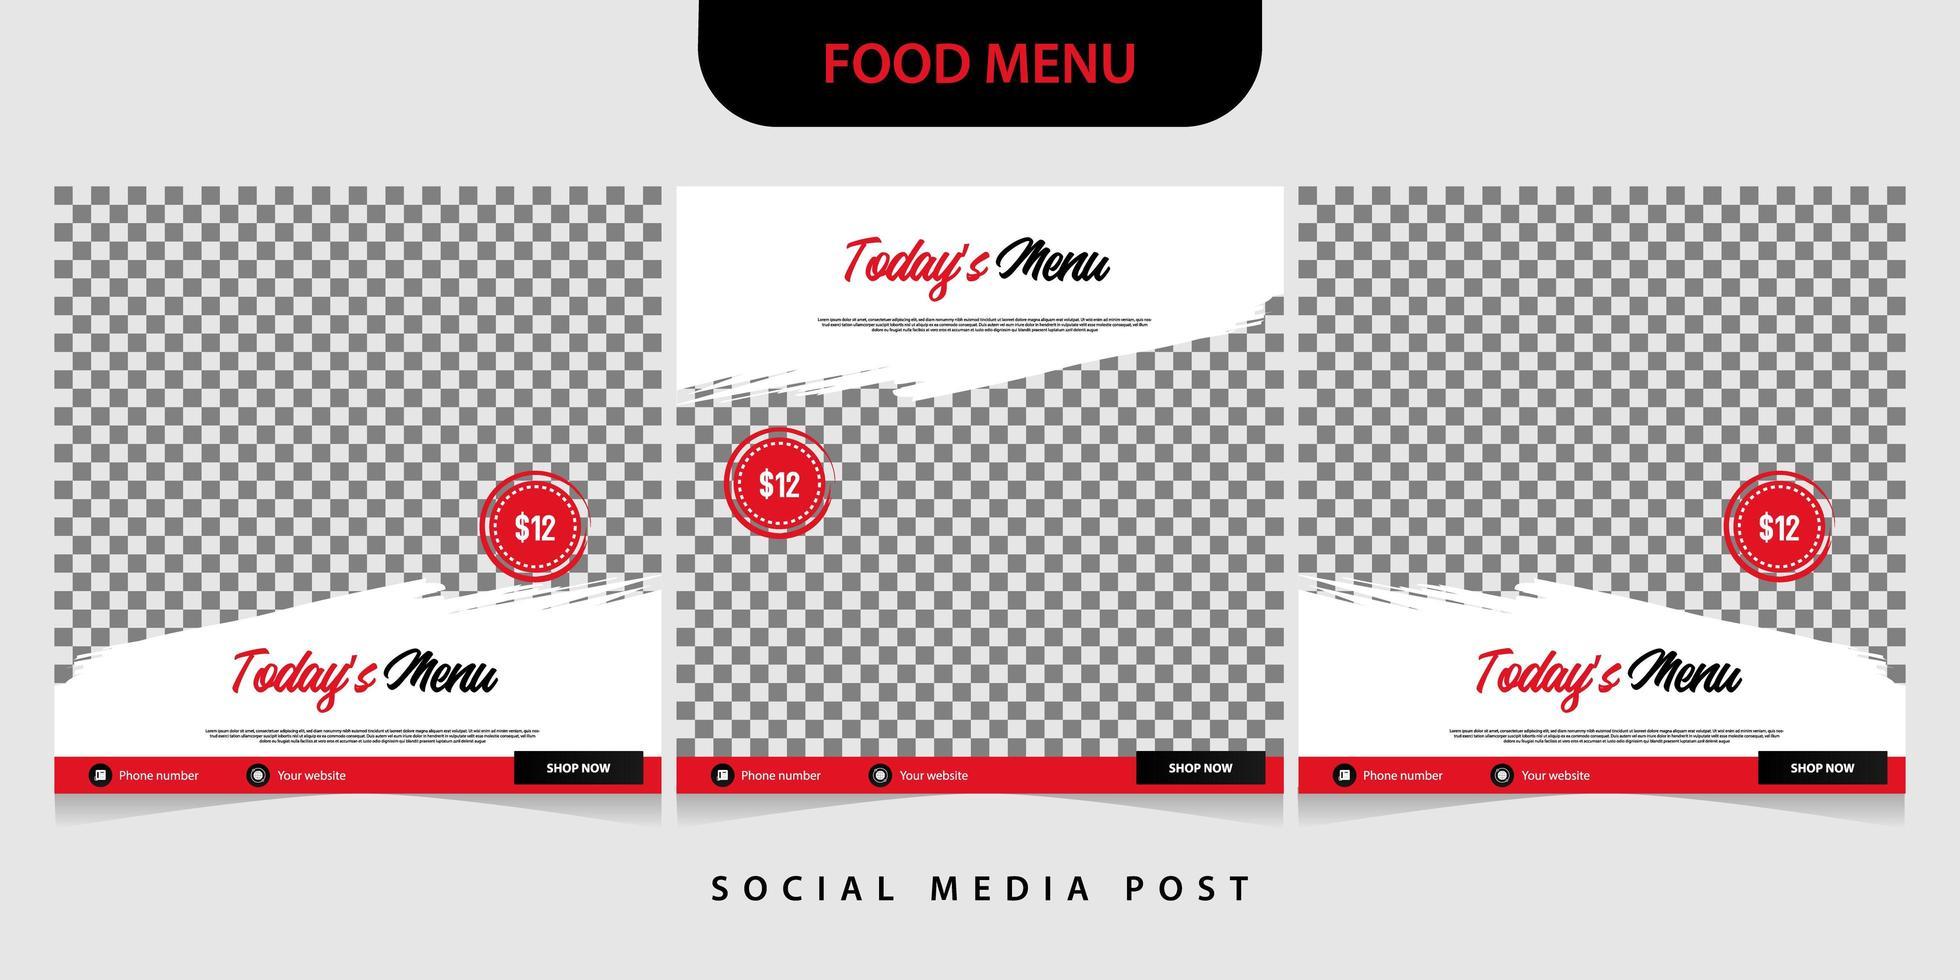 Set of food banner template for social media post vector